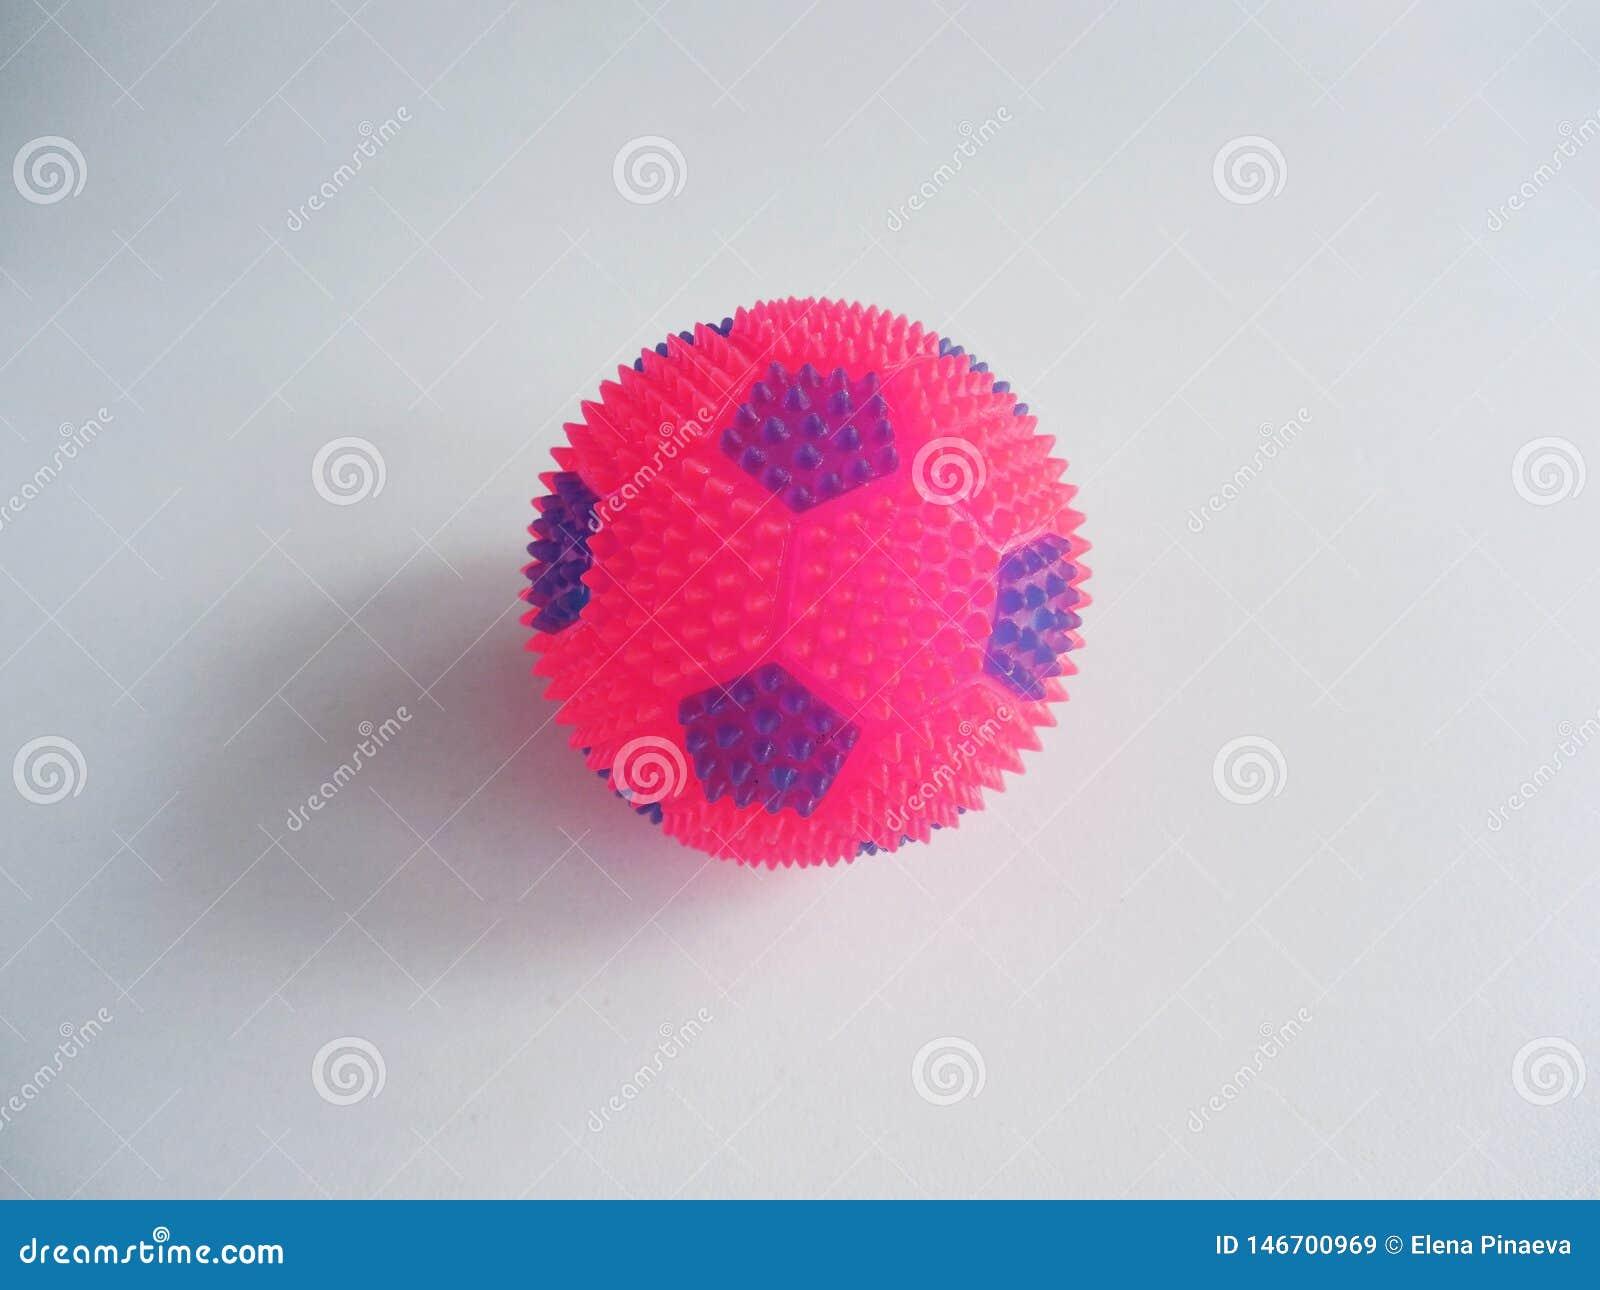 Studded ball on white background